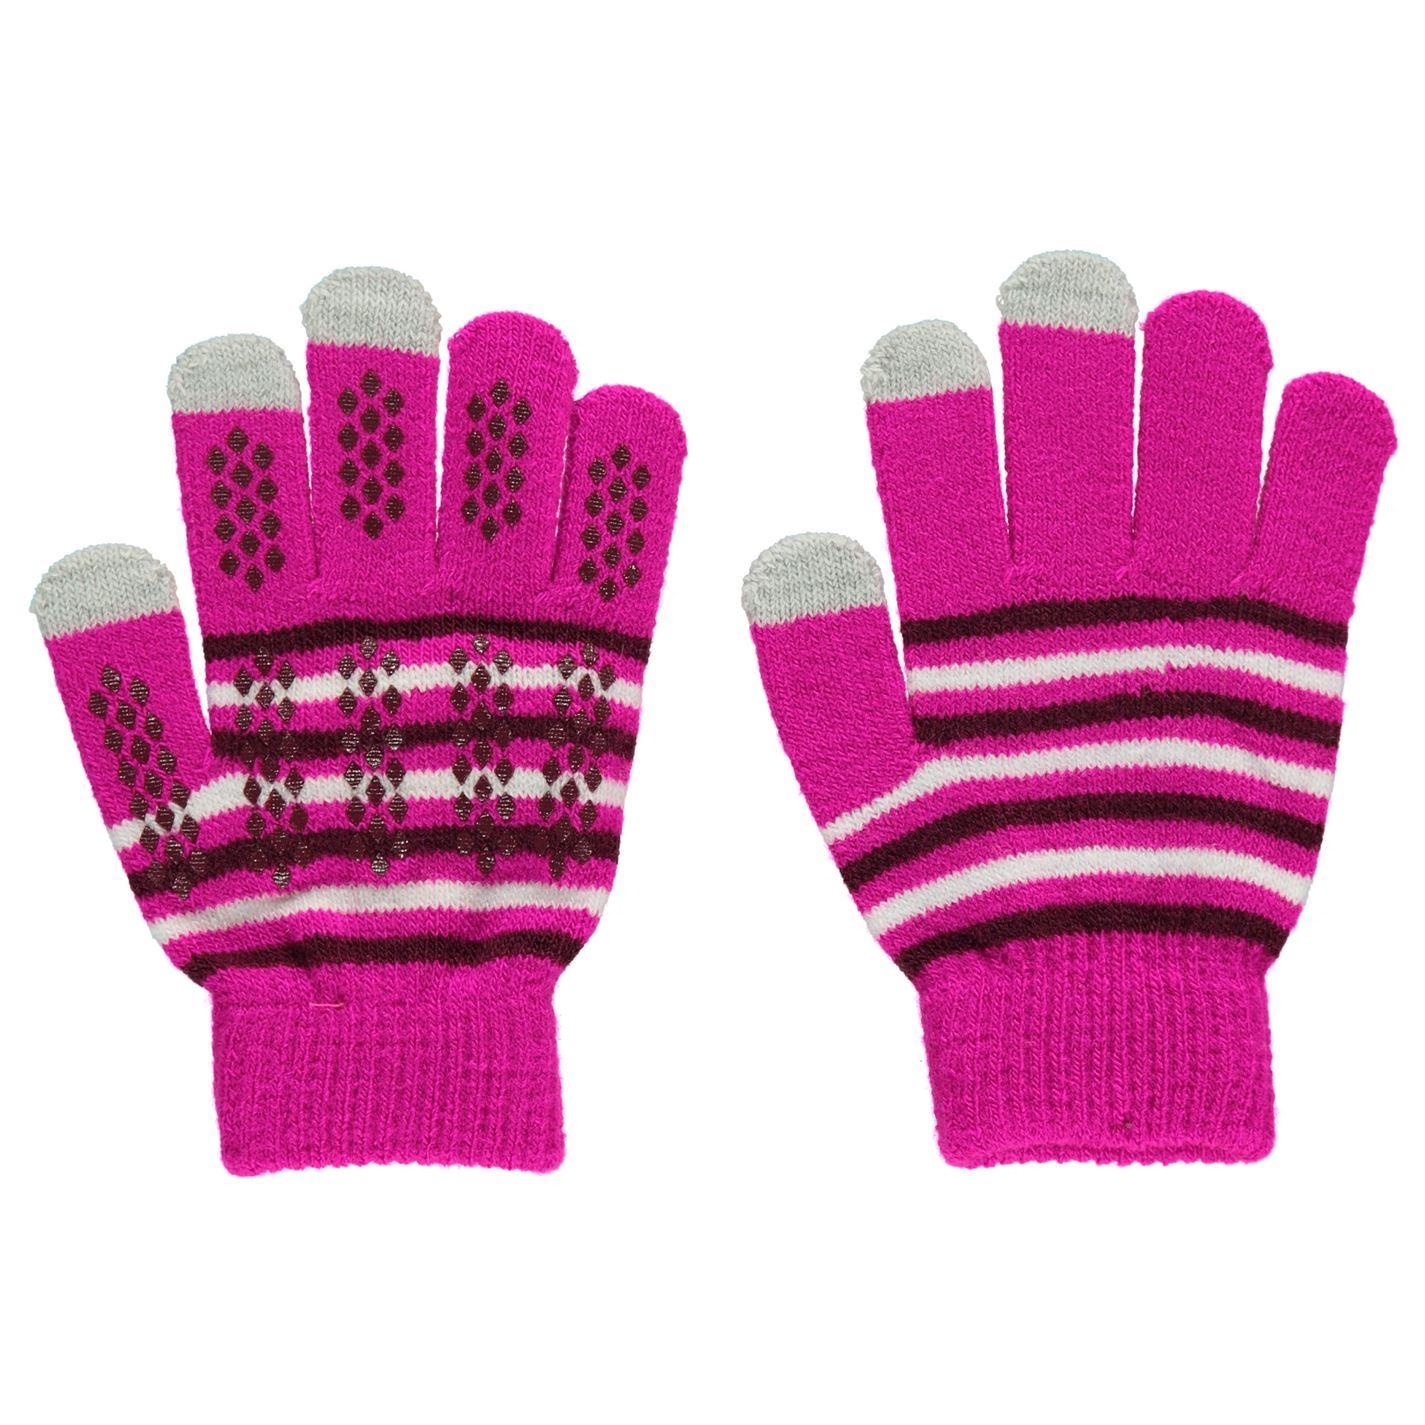 Gelert-Kids-Magic-Gloves-Juniors-Walking-Pattern-Winter-Stretch-Print-Stretchy